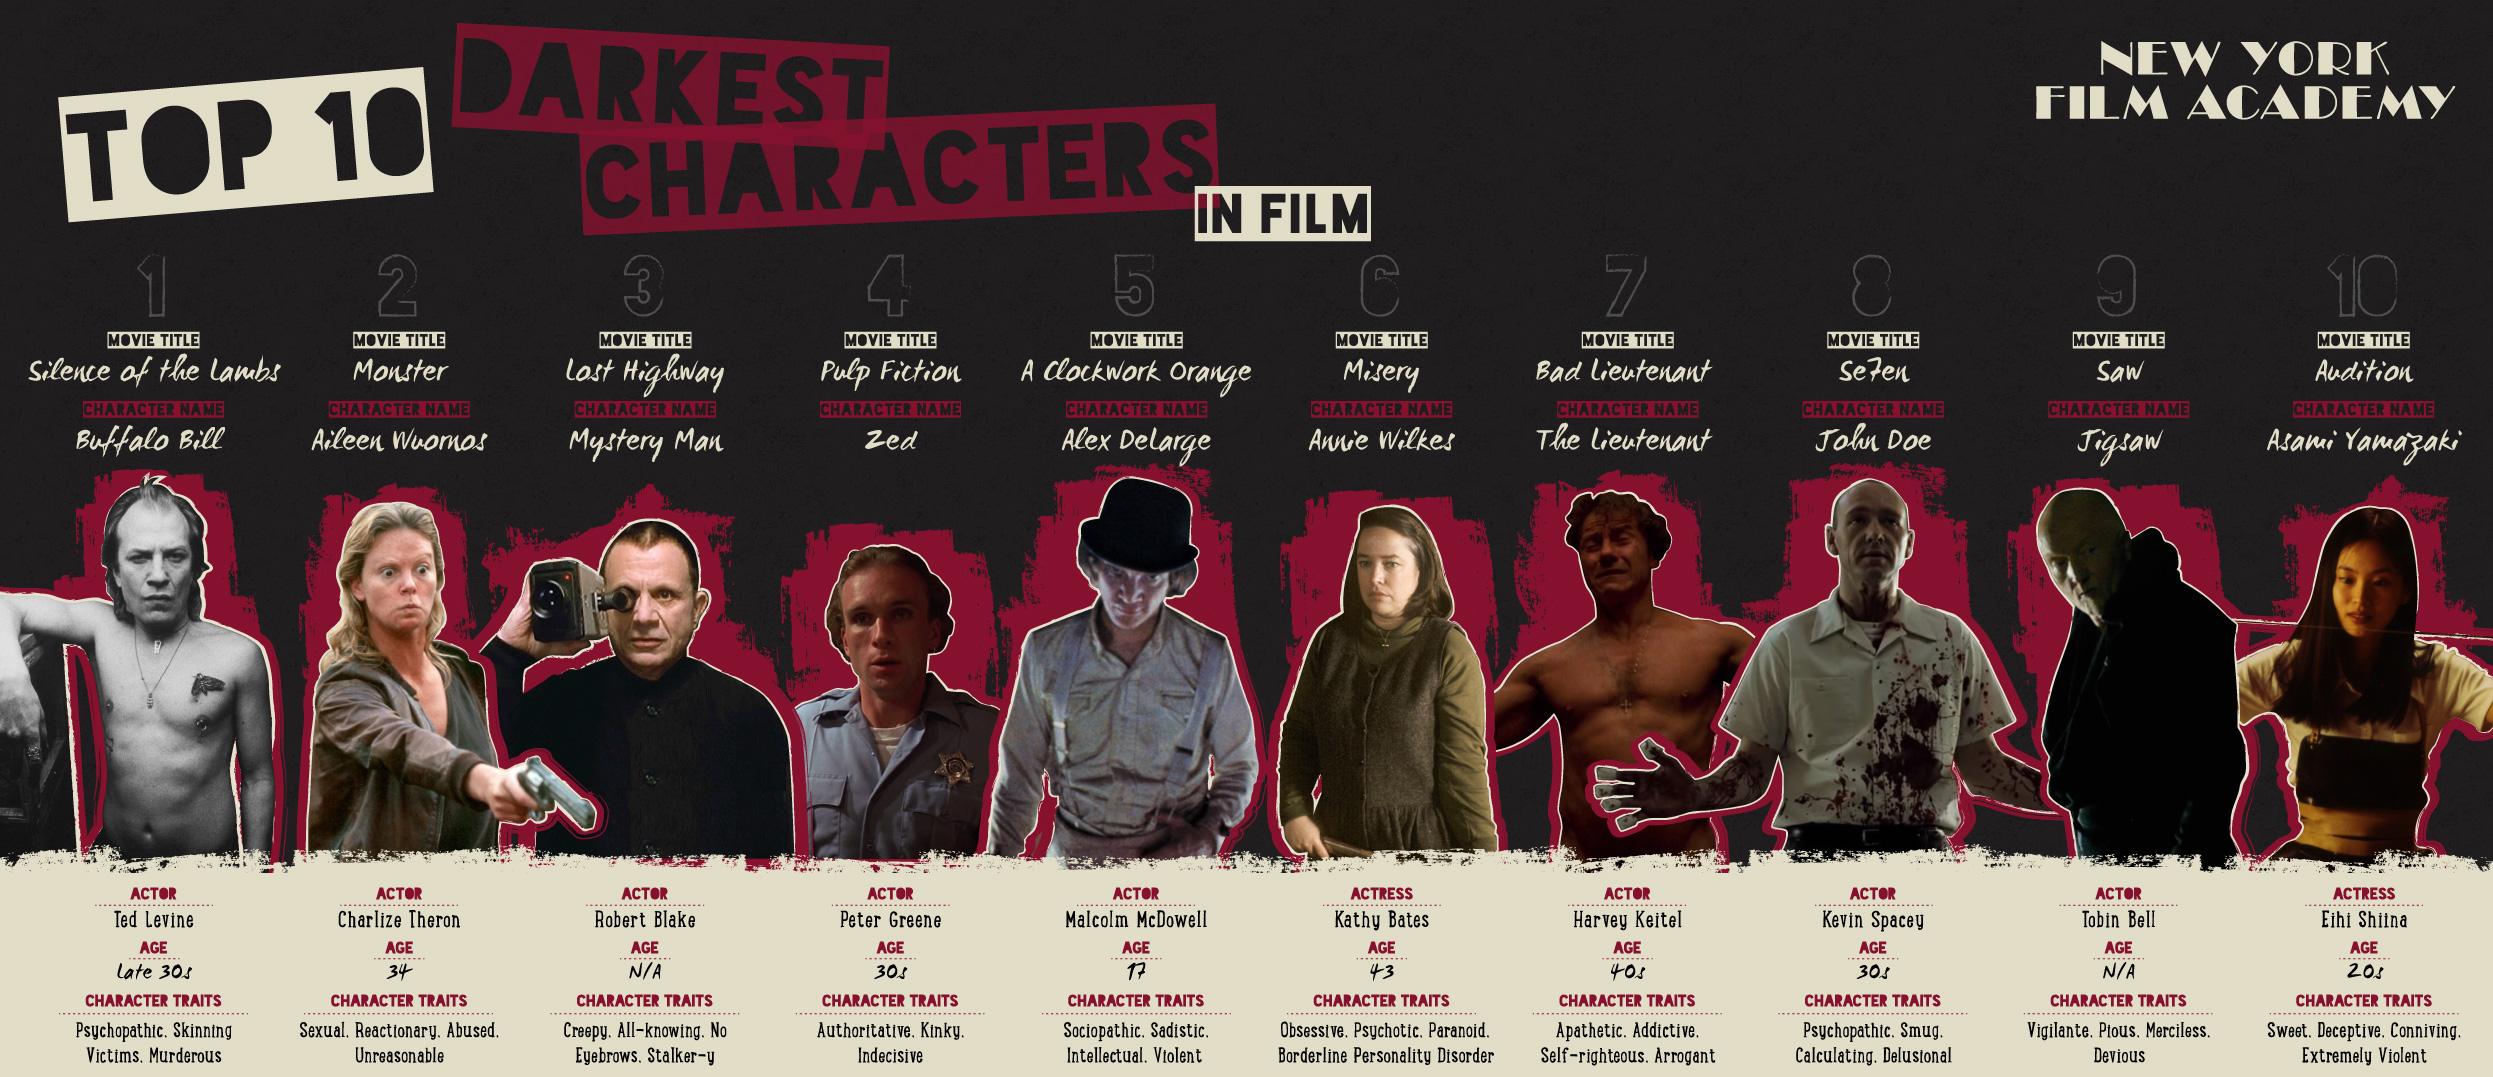 Top 10 Darkest Characters In Film